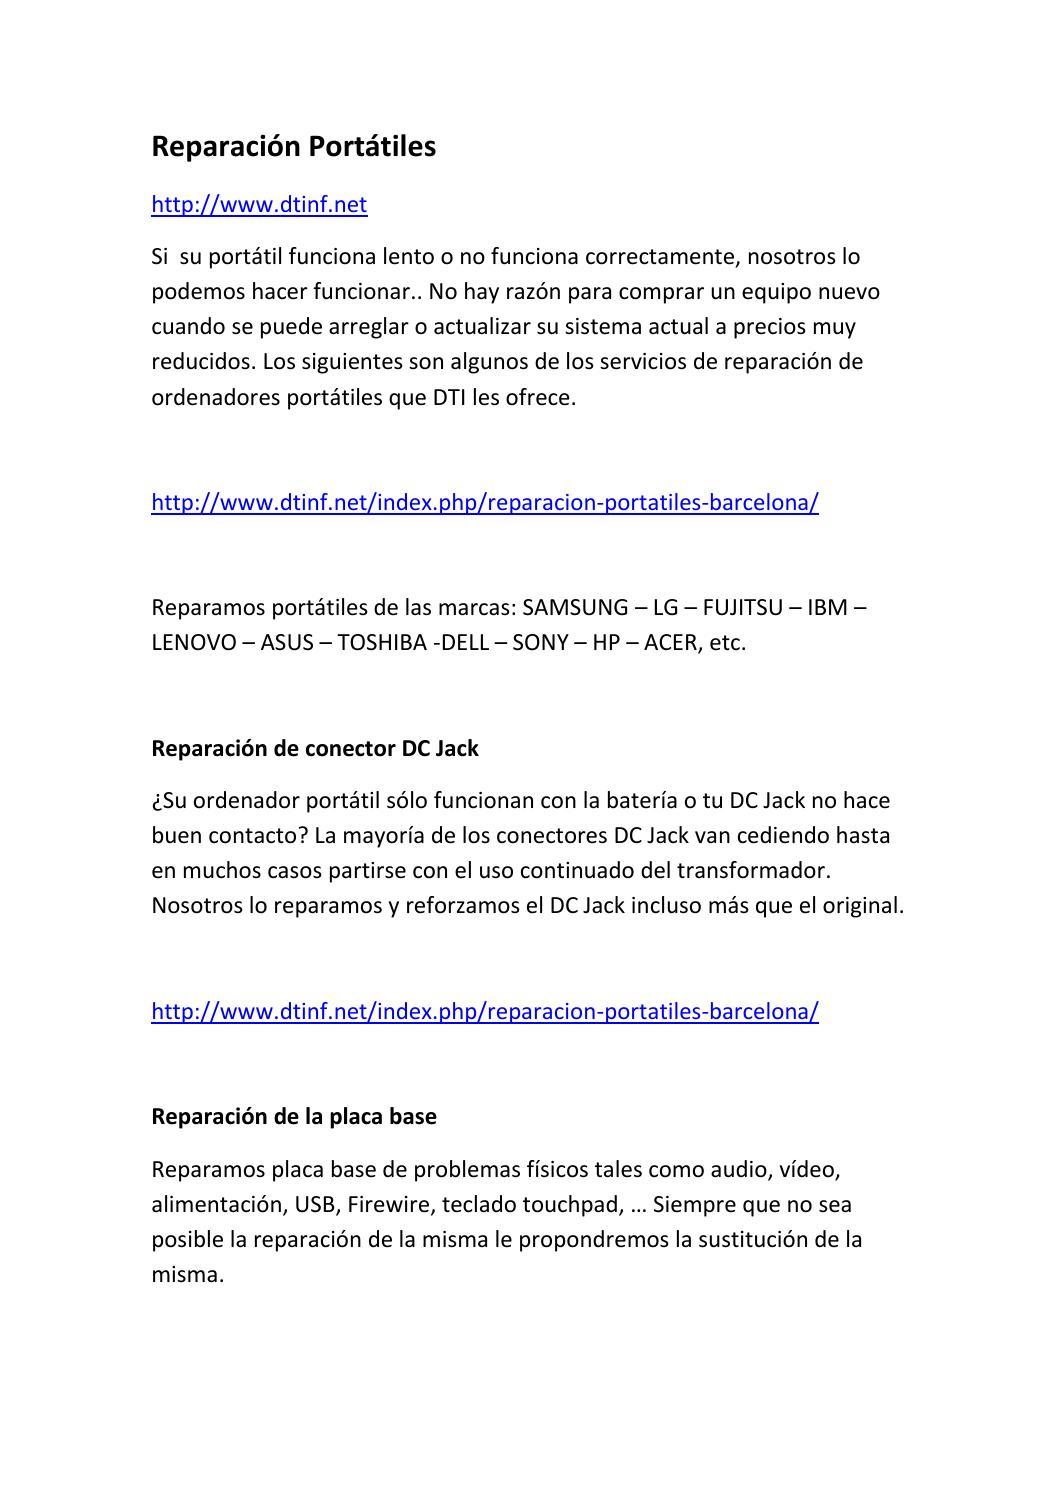 Reparacion portatiles barcelona by programa gestion daf for Reparacion de portatiles en barcelona